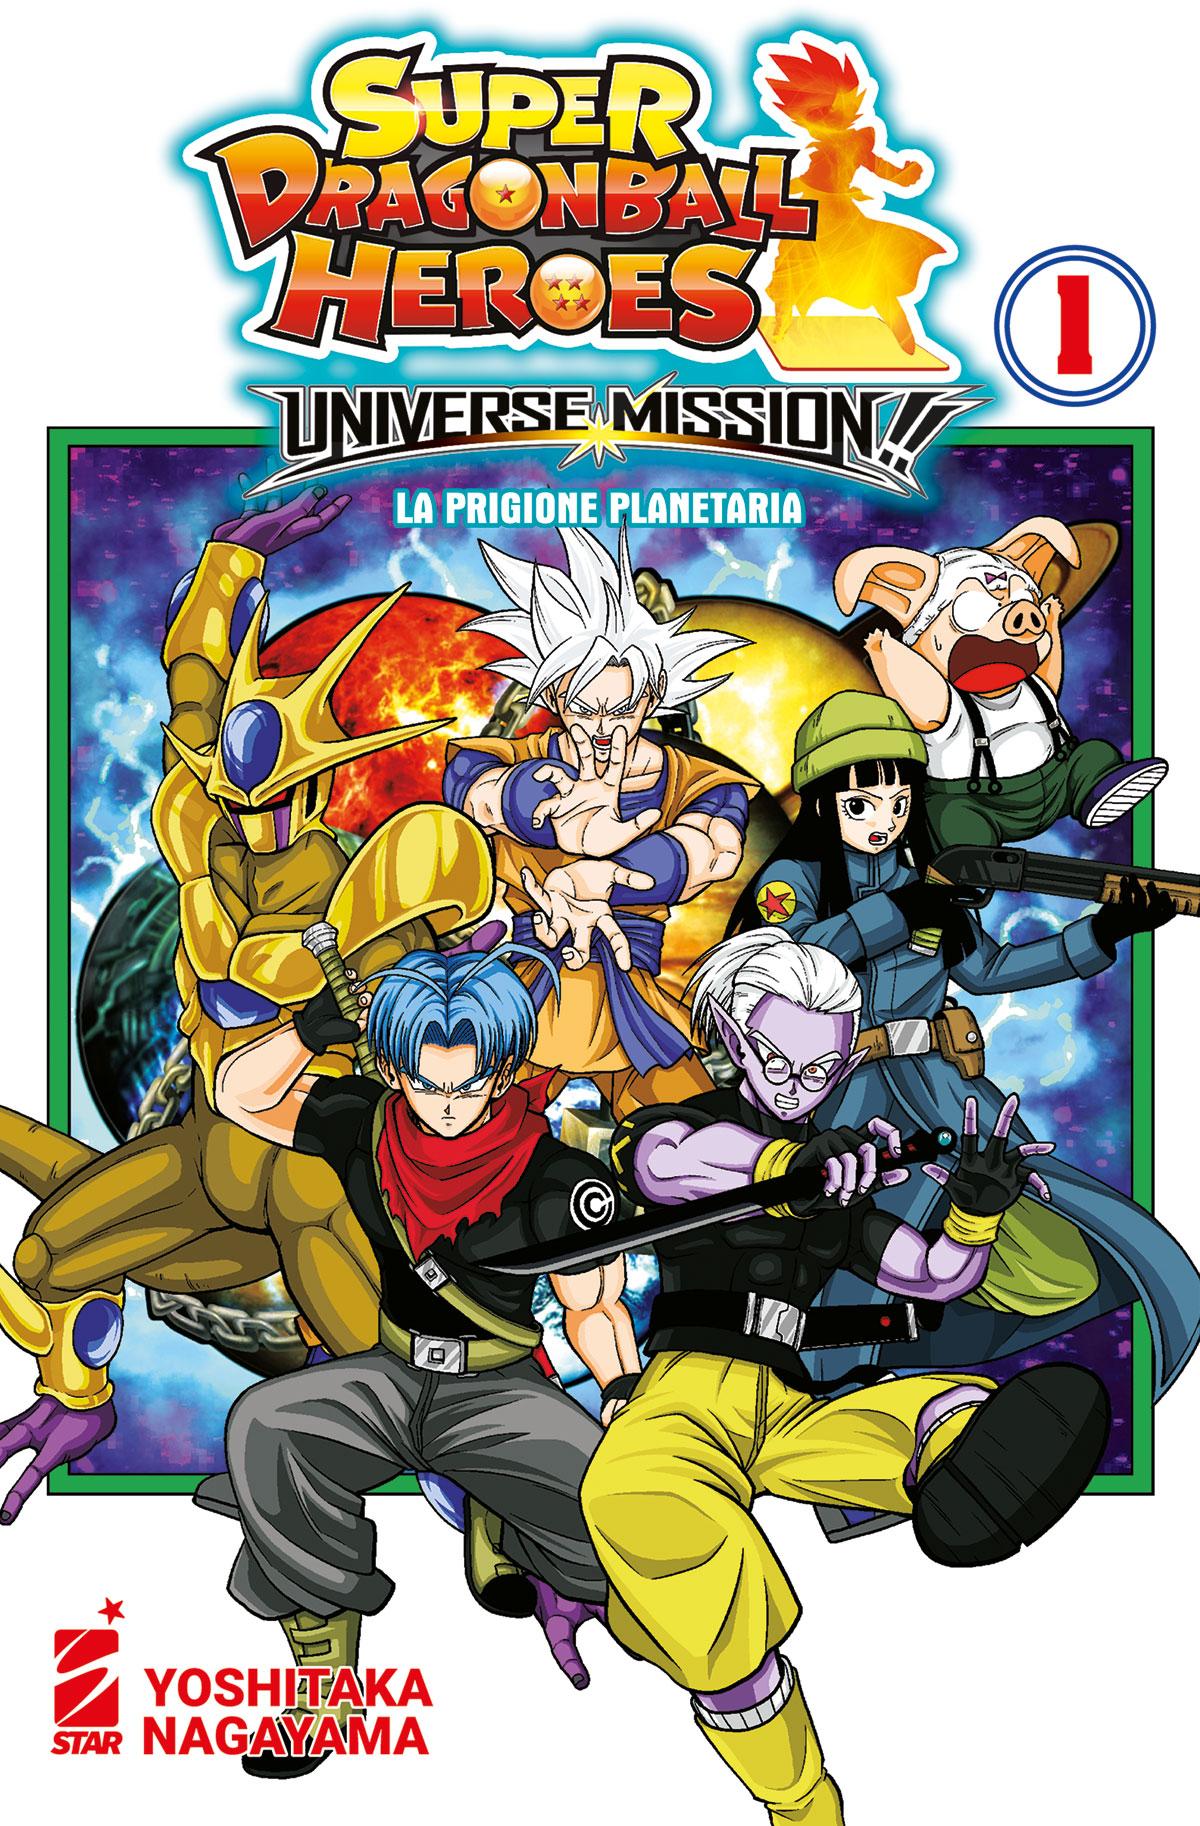 superdragonballheroes universemission1 Serial Gamer